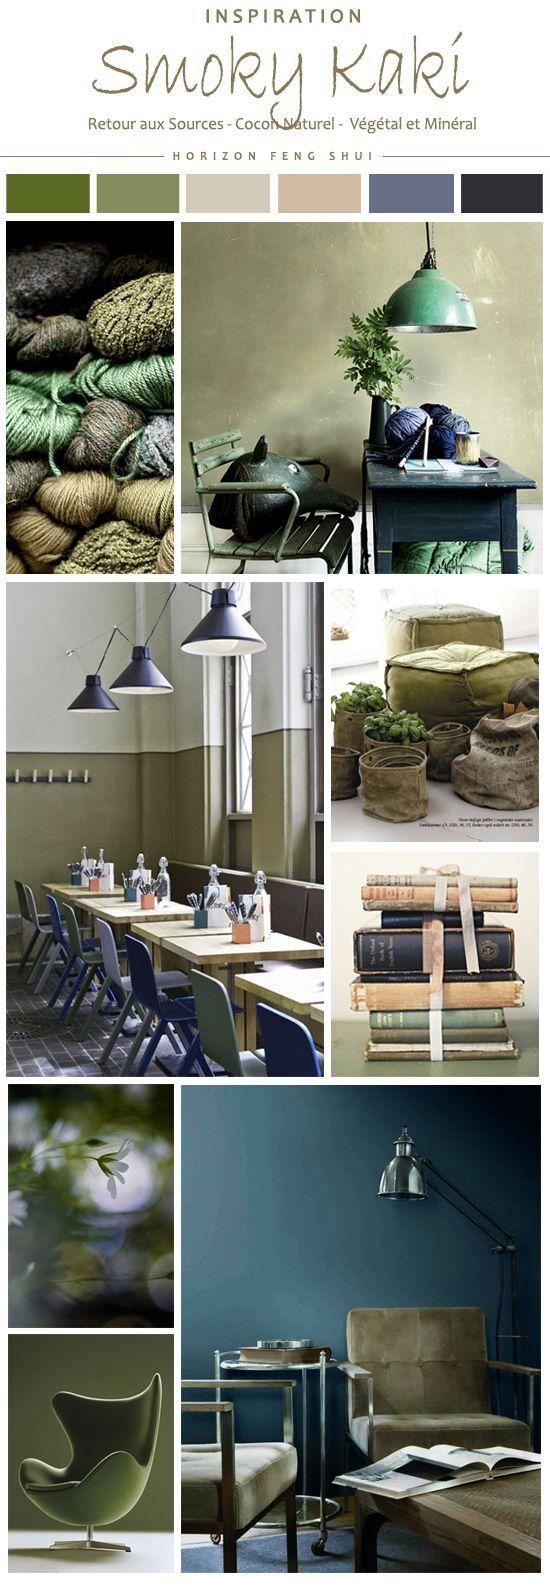 d co salon tendance joaillerie 2017 tendance couleur smoky kaki tendance id e jo. Black Bedroom Furniture Sets. Home Design Ideas